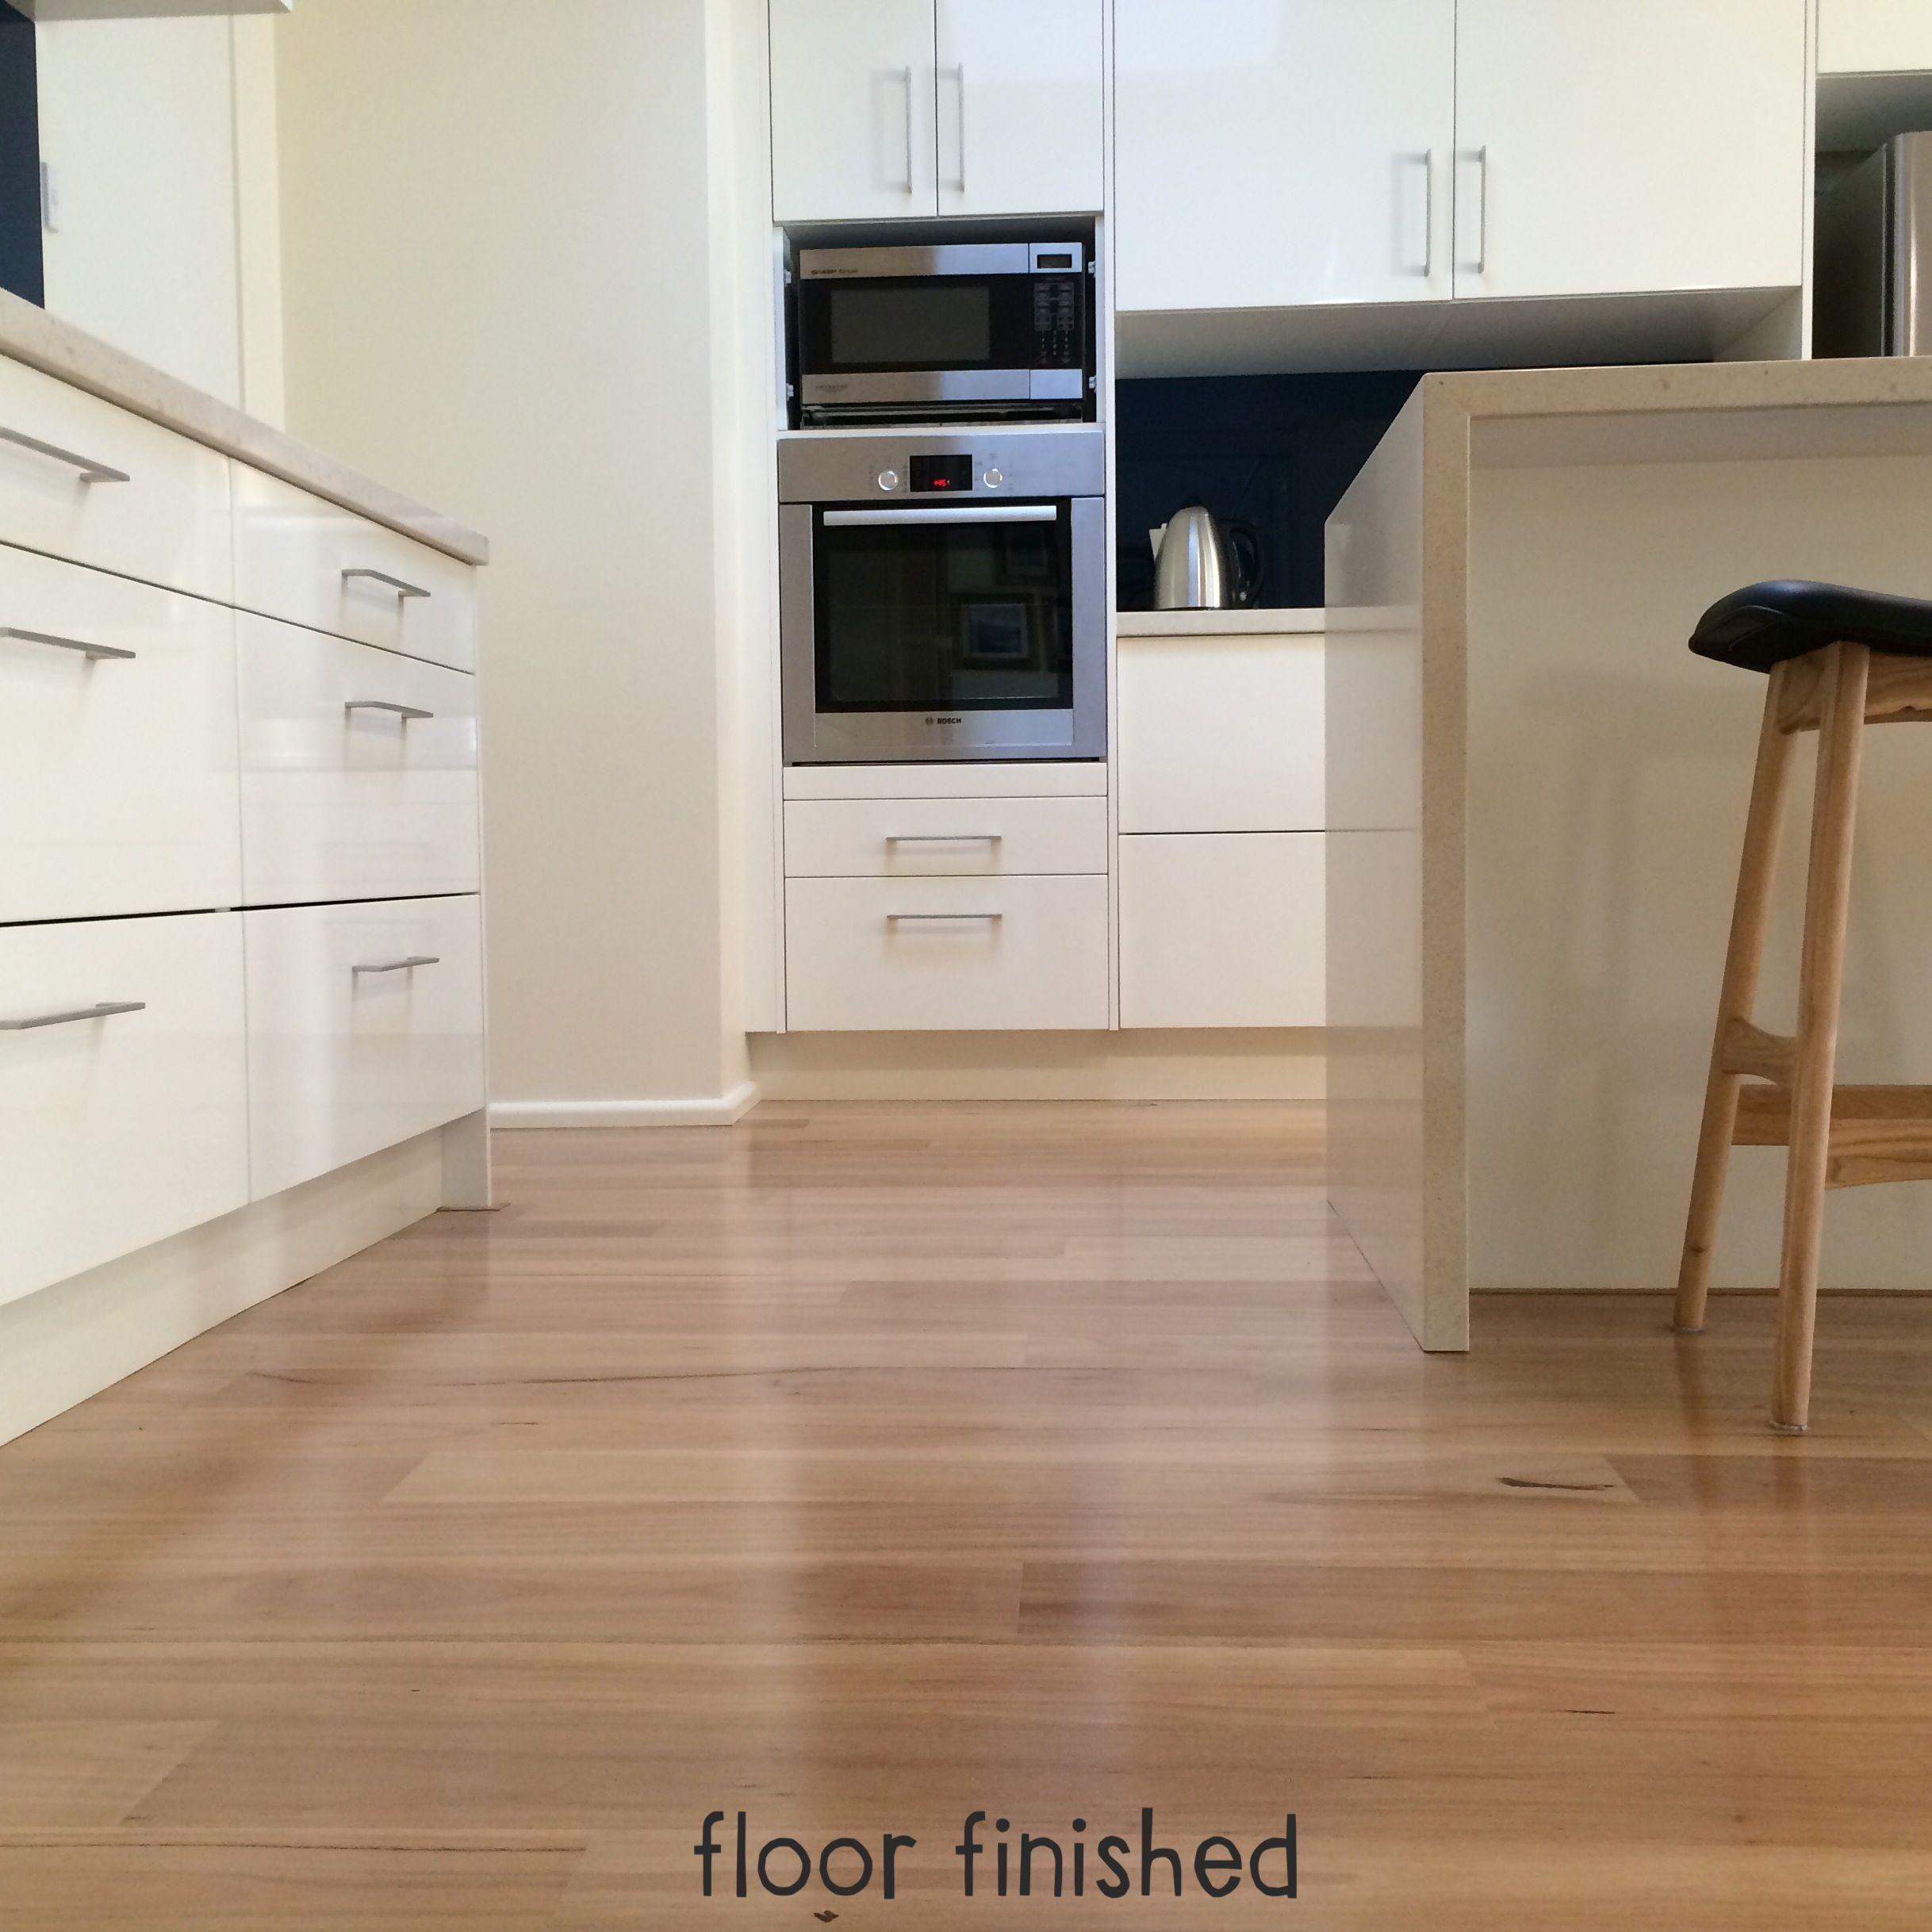 Blackbutt floors finish our new kitchen fiona moore for New floor